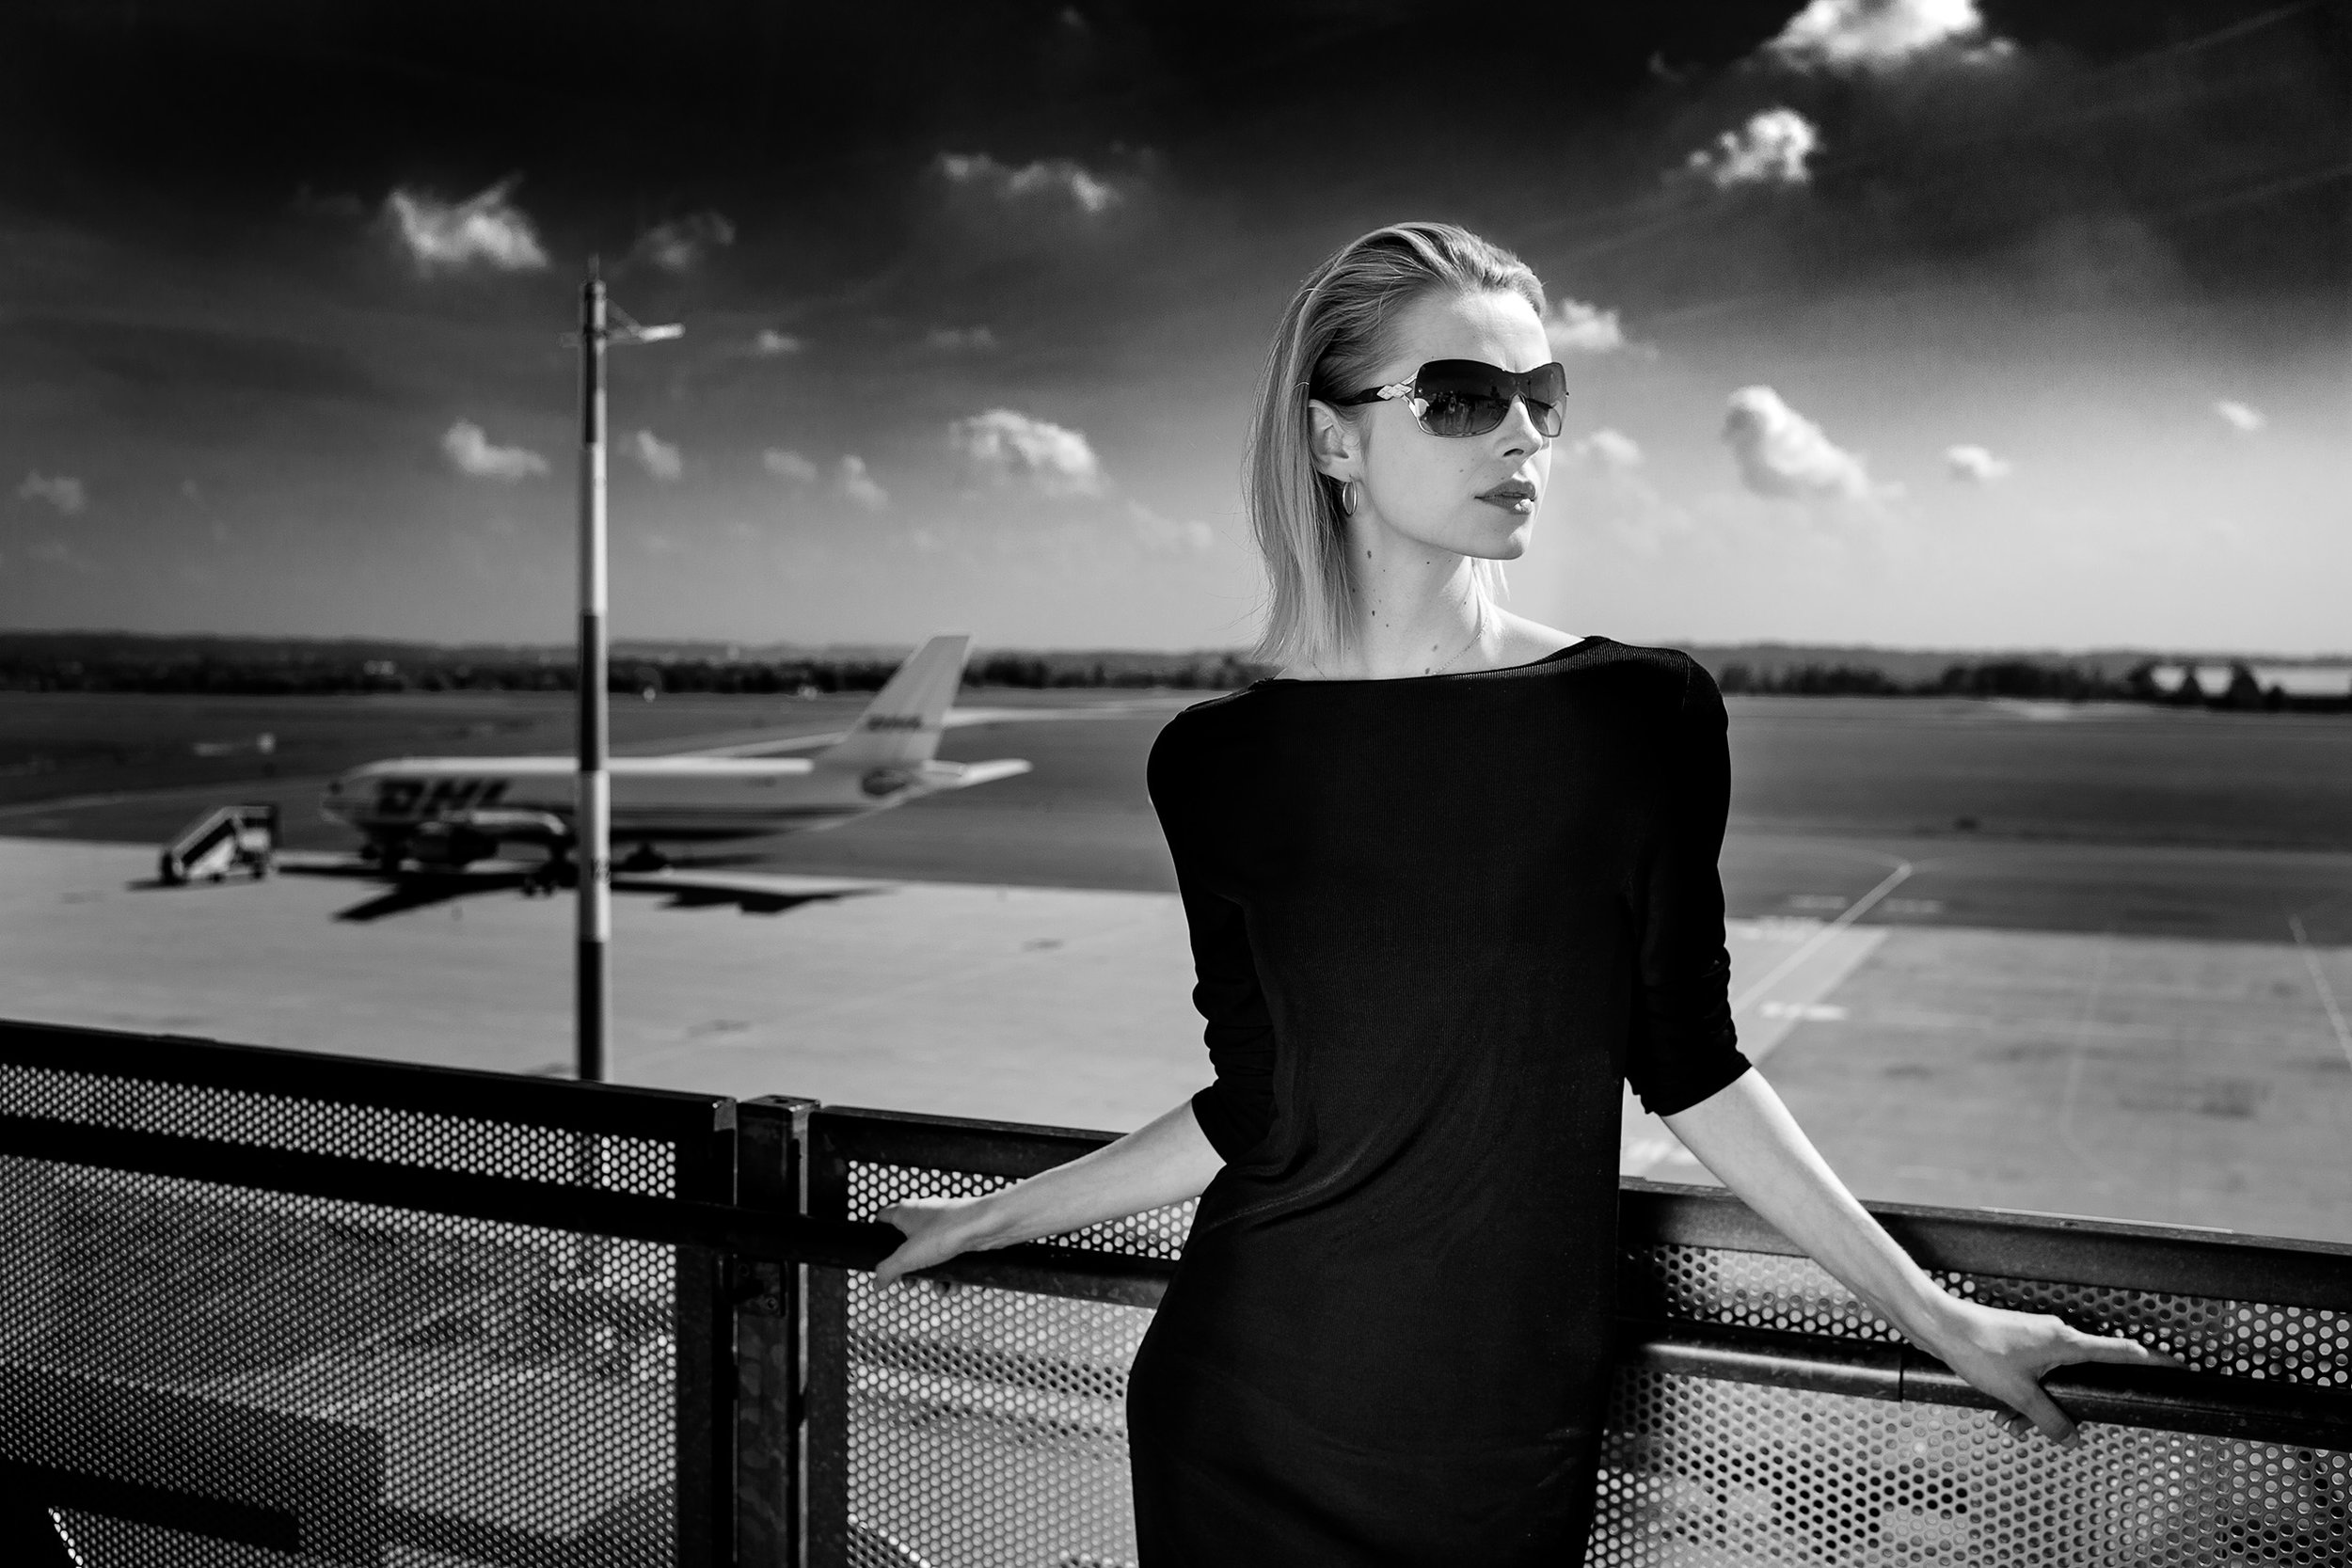 Anna S. (Visage Models) am Blue Danube Airport Linz by Eric Berger / Leica M10-P